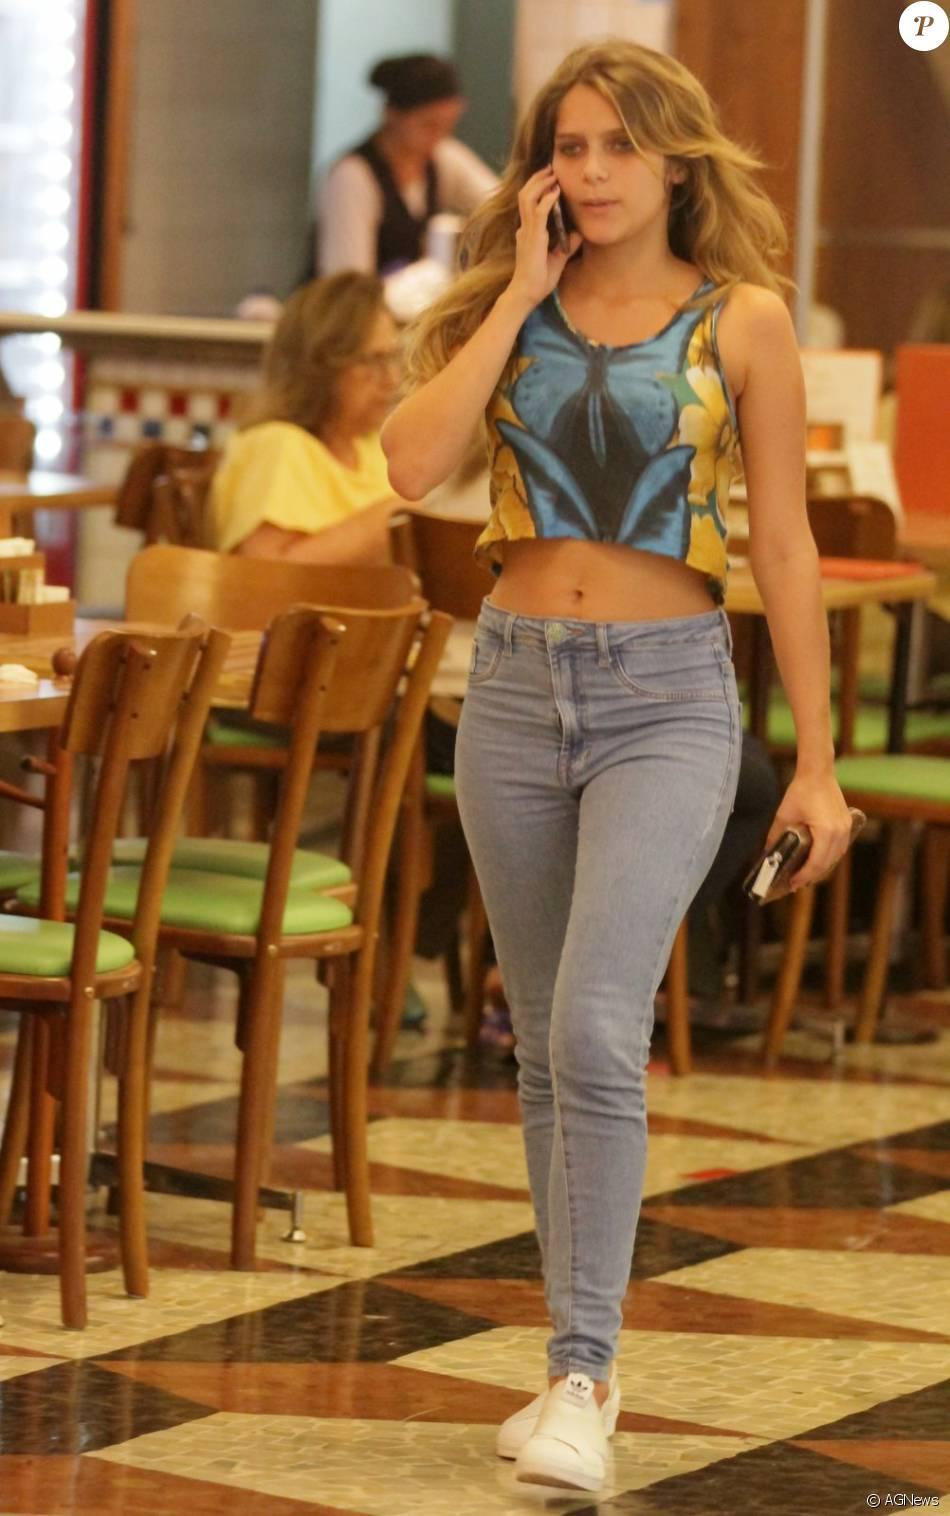 Isabella Santoni usou um top colorido que deixou a barriga de fora durante passeio no shopping nesta terça-feira, dia 16 de fevereiro de 2016